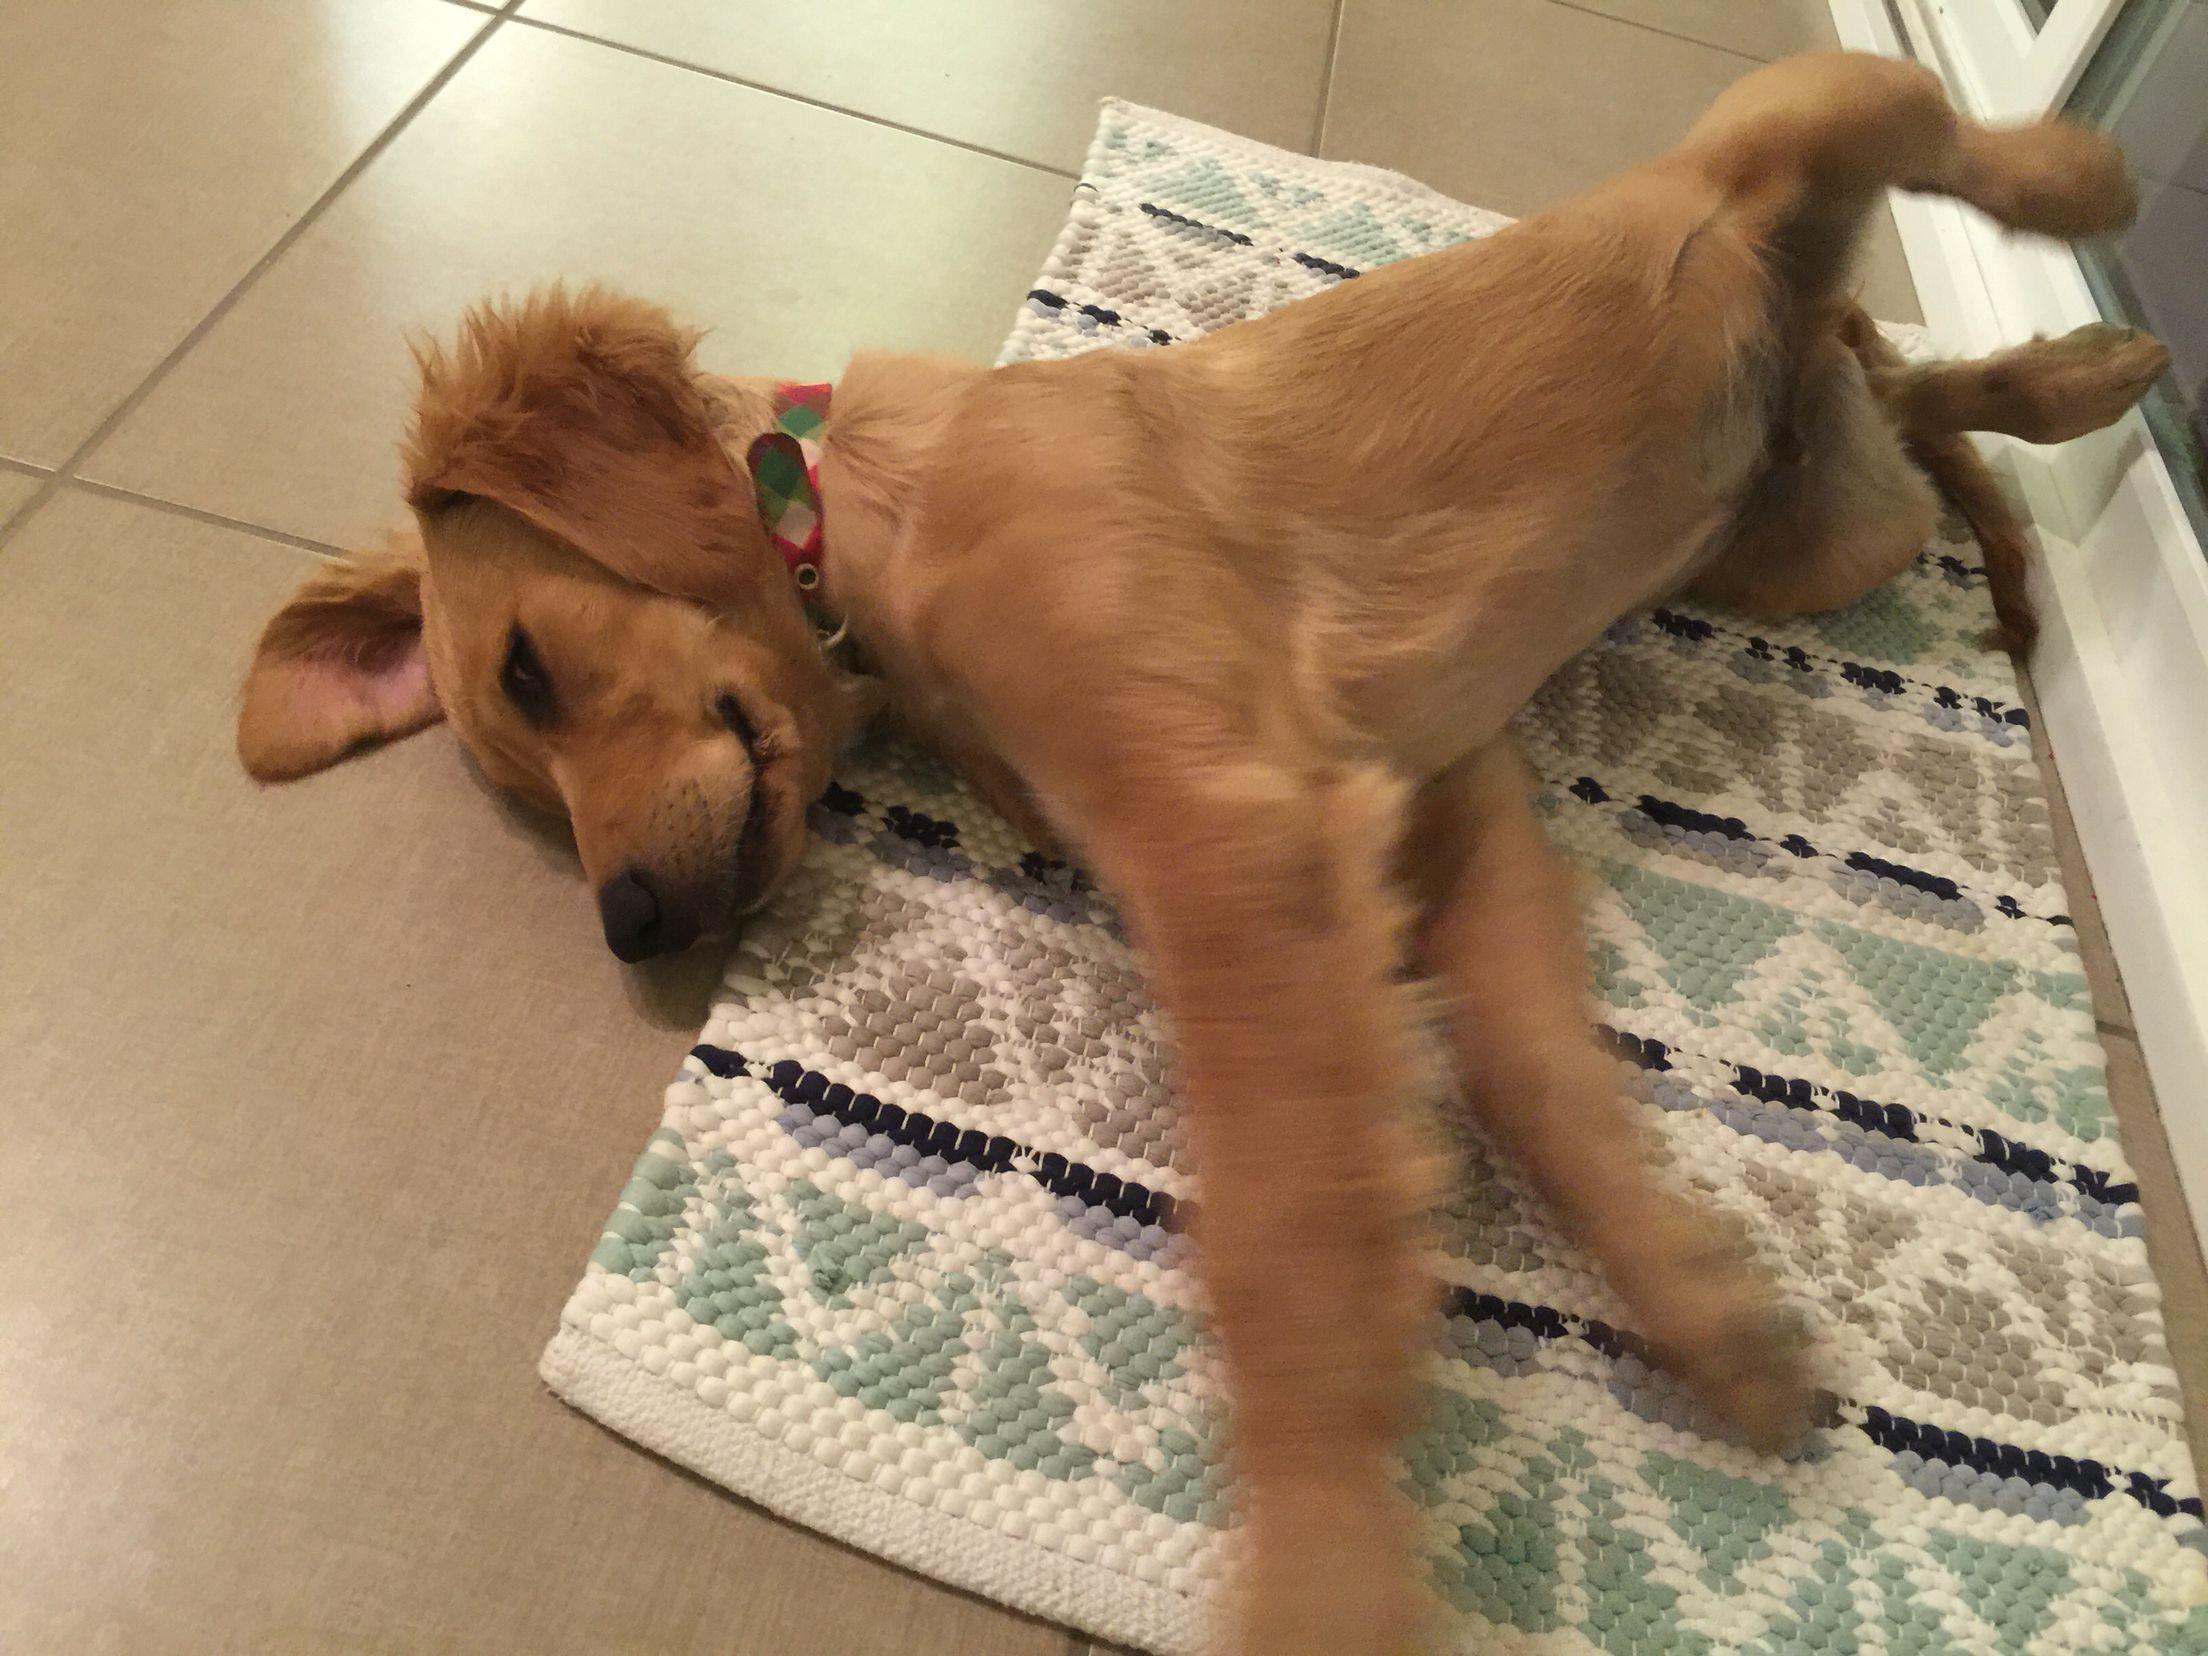 16 Weeks Old Golden Retriever 16 Weeks Puppies